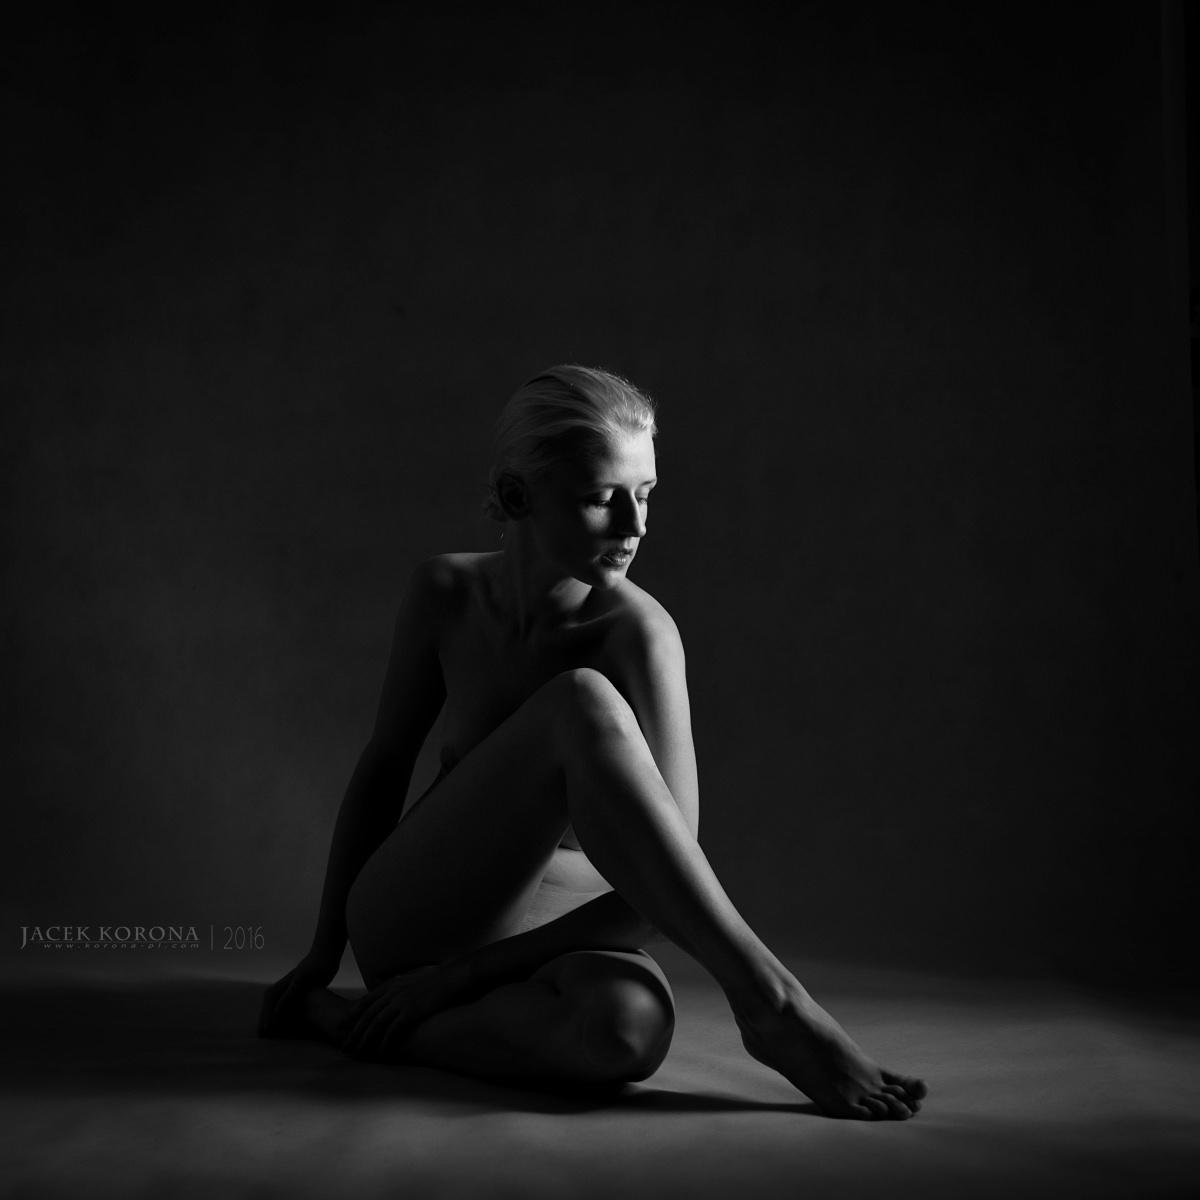 Photo in Nude #canon 50/1.8 stm #2015 #6d #art #canon #cracow #fotografia #jacek #korona #koronapl #kraków #model #photography #poland #polska #© #beautiful #black #bw #lovely #monochrome #portrait #pretty #sensual #sublime #white #woman